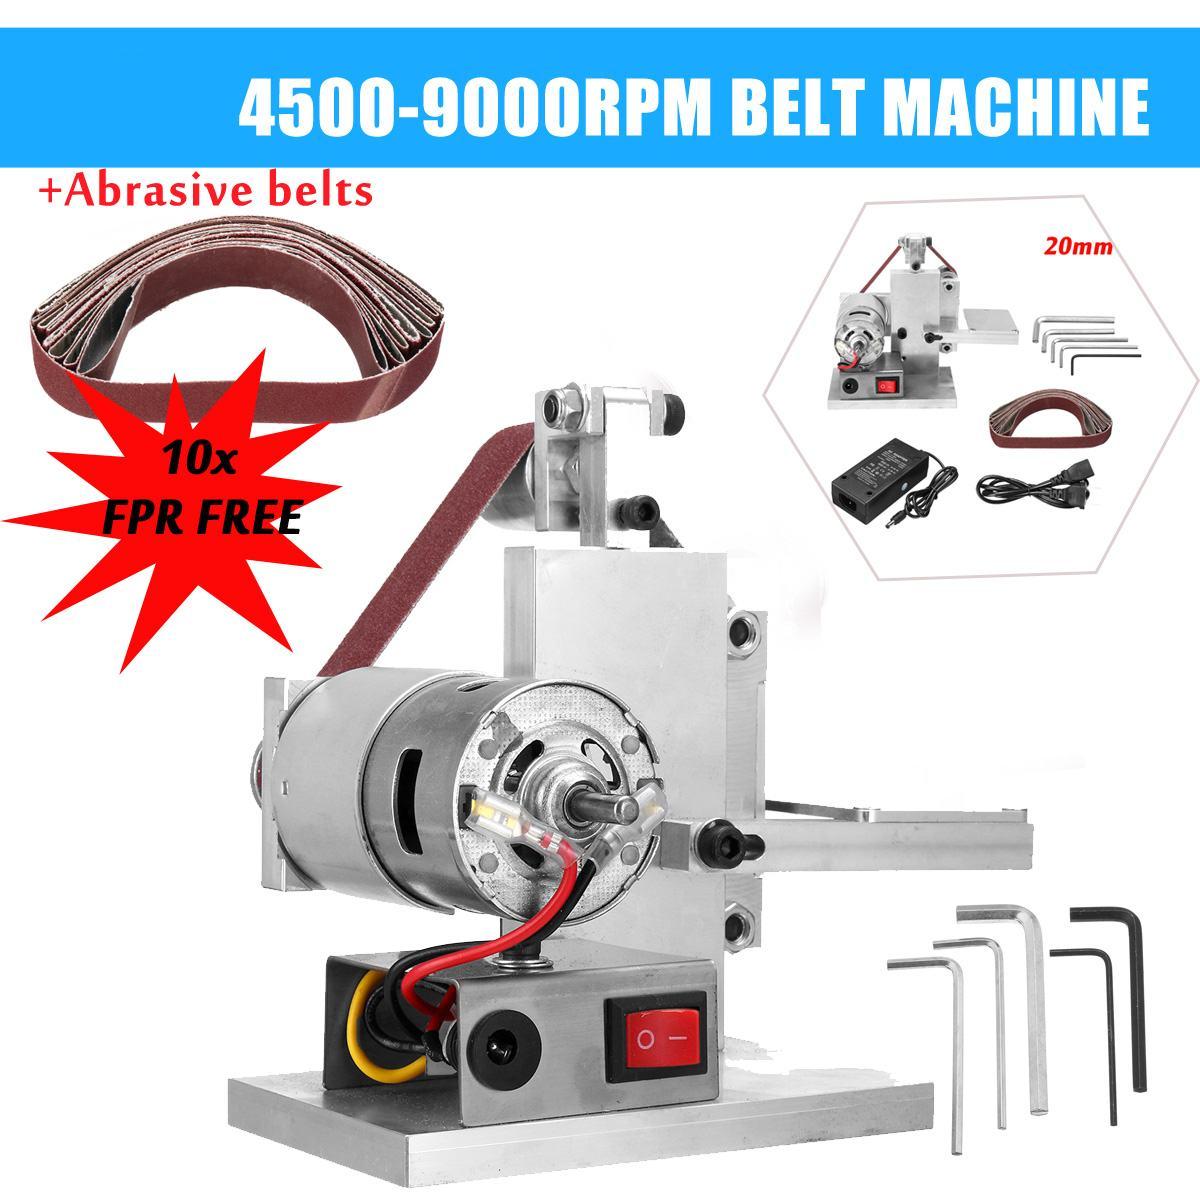 110-240 V 10/20mm Mini Elétrica Lixadeira Polimento Máquina De Moer Bordas Faca Afiador de Madeira de Metal moedor de Polimento